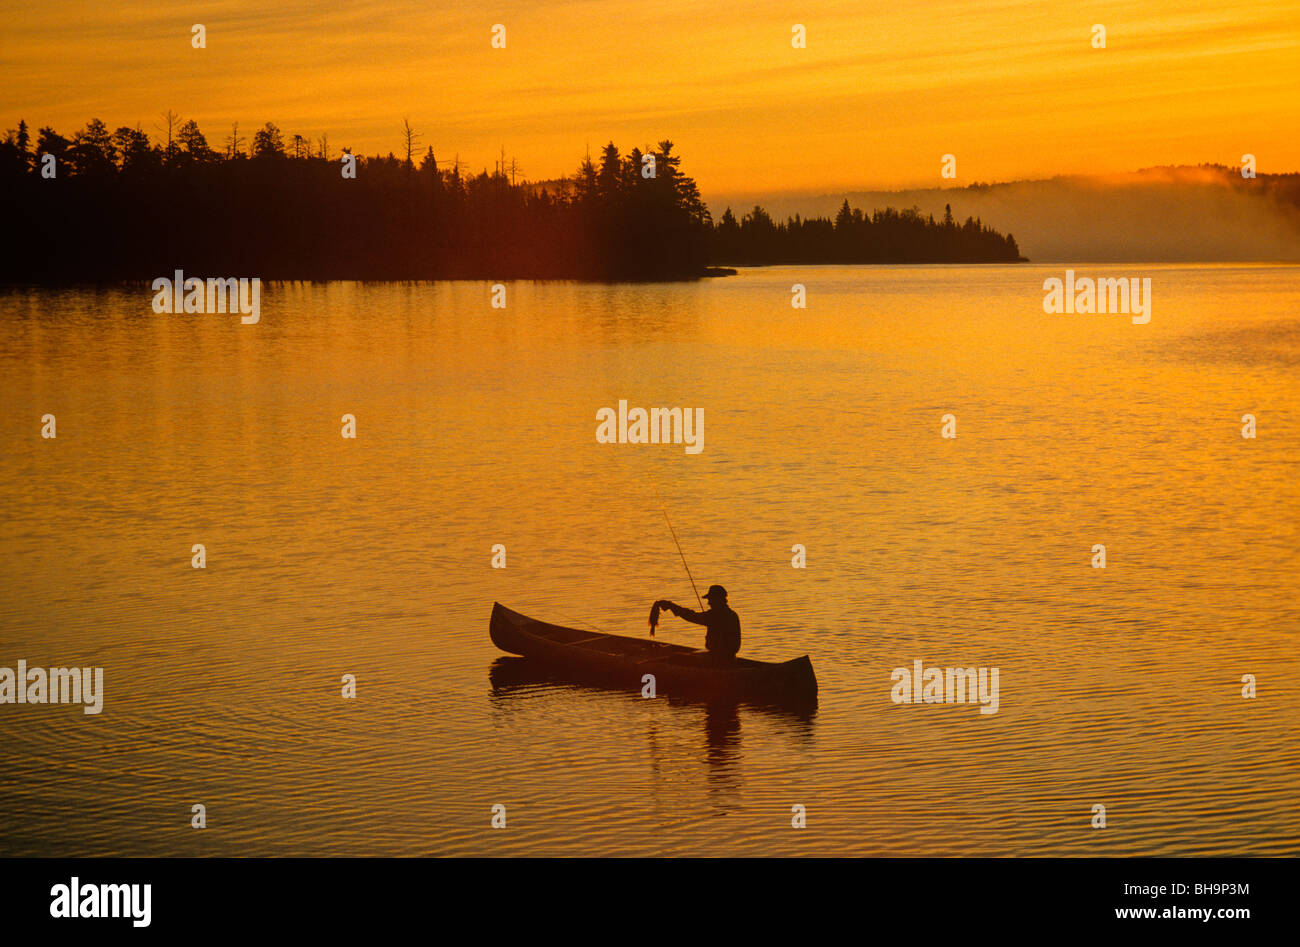 Fishing at sunrise, Boundary Waters Canoe Area lake, border of Minnesota and Ontario, Canada, USA, - Stock Image